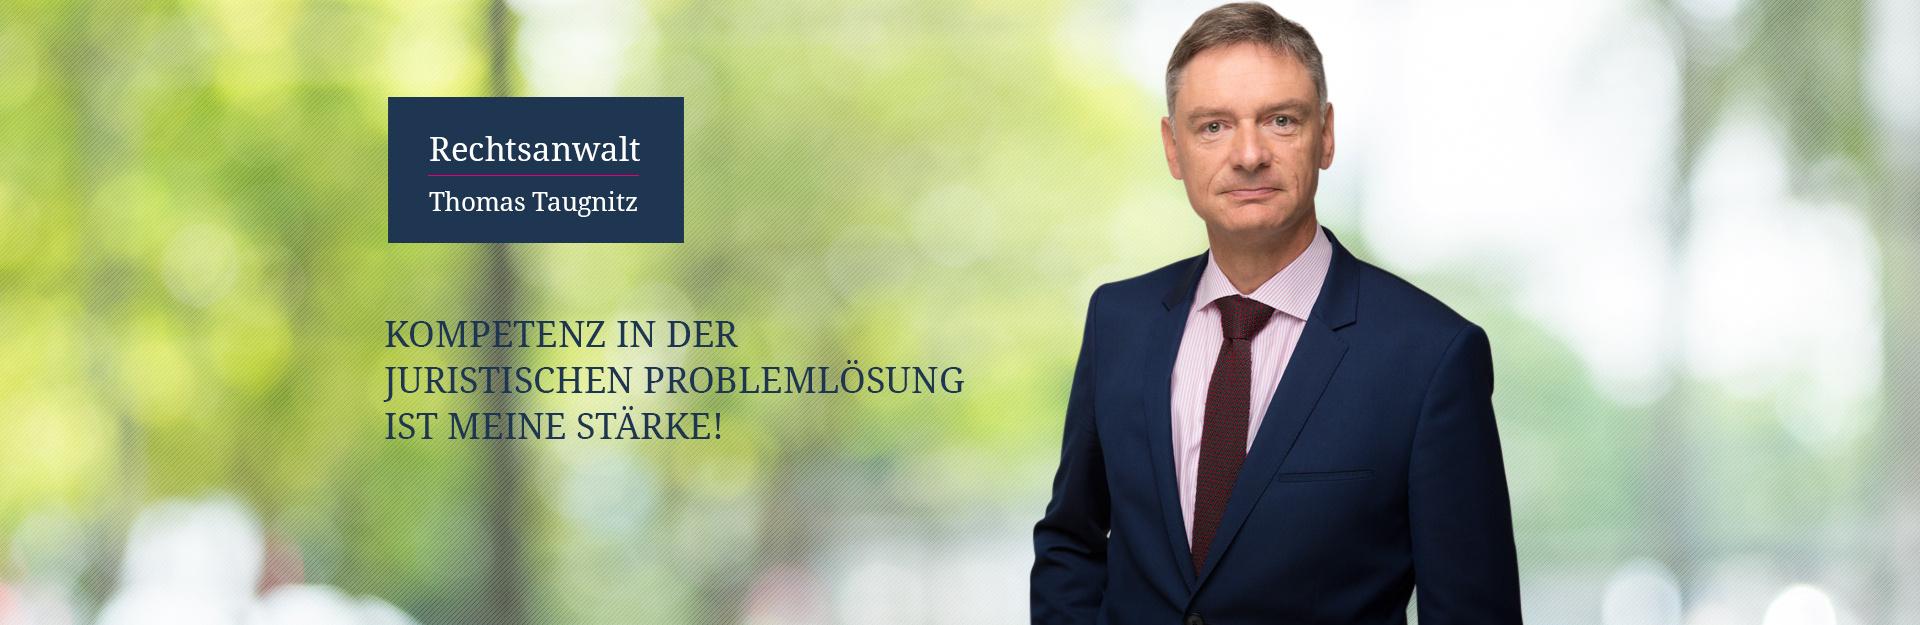 Banner Rechtsanwalt Taugnitz